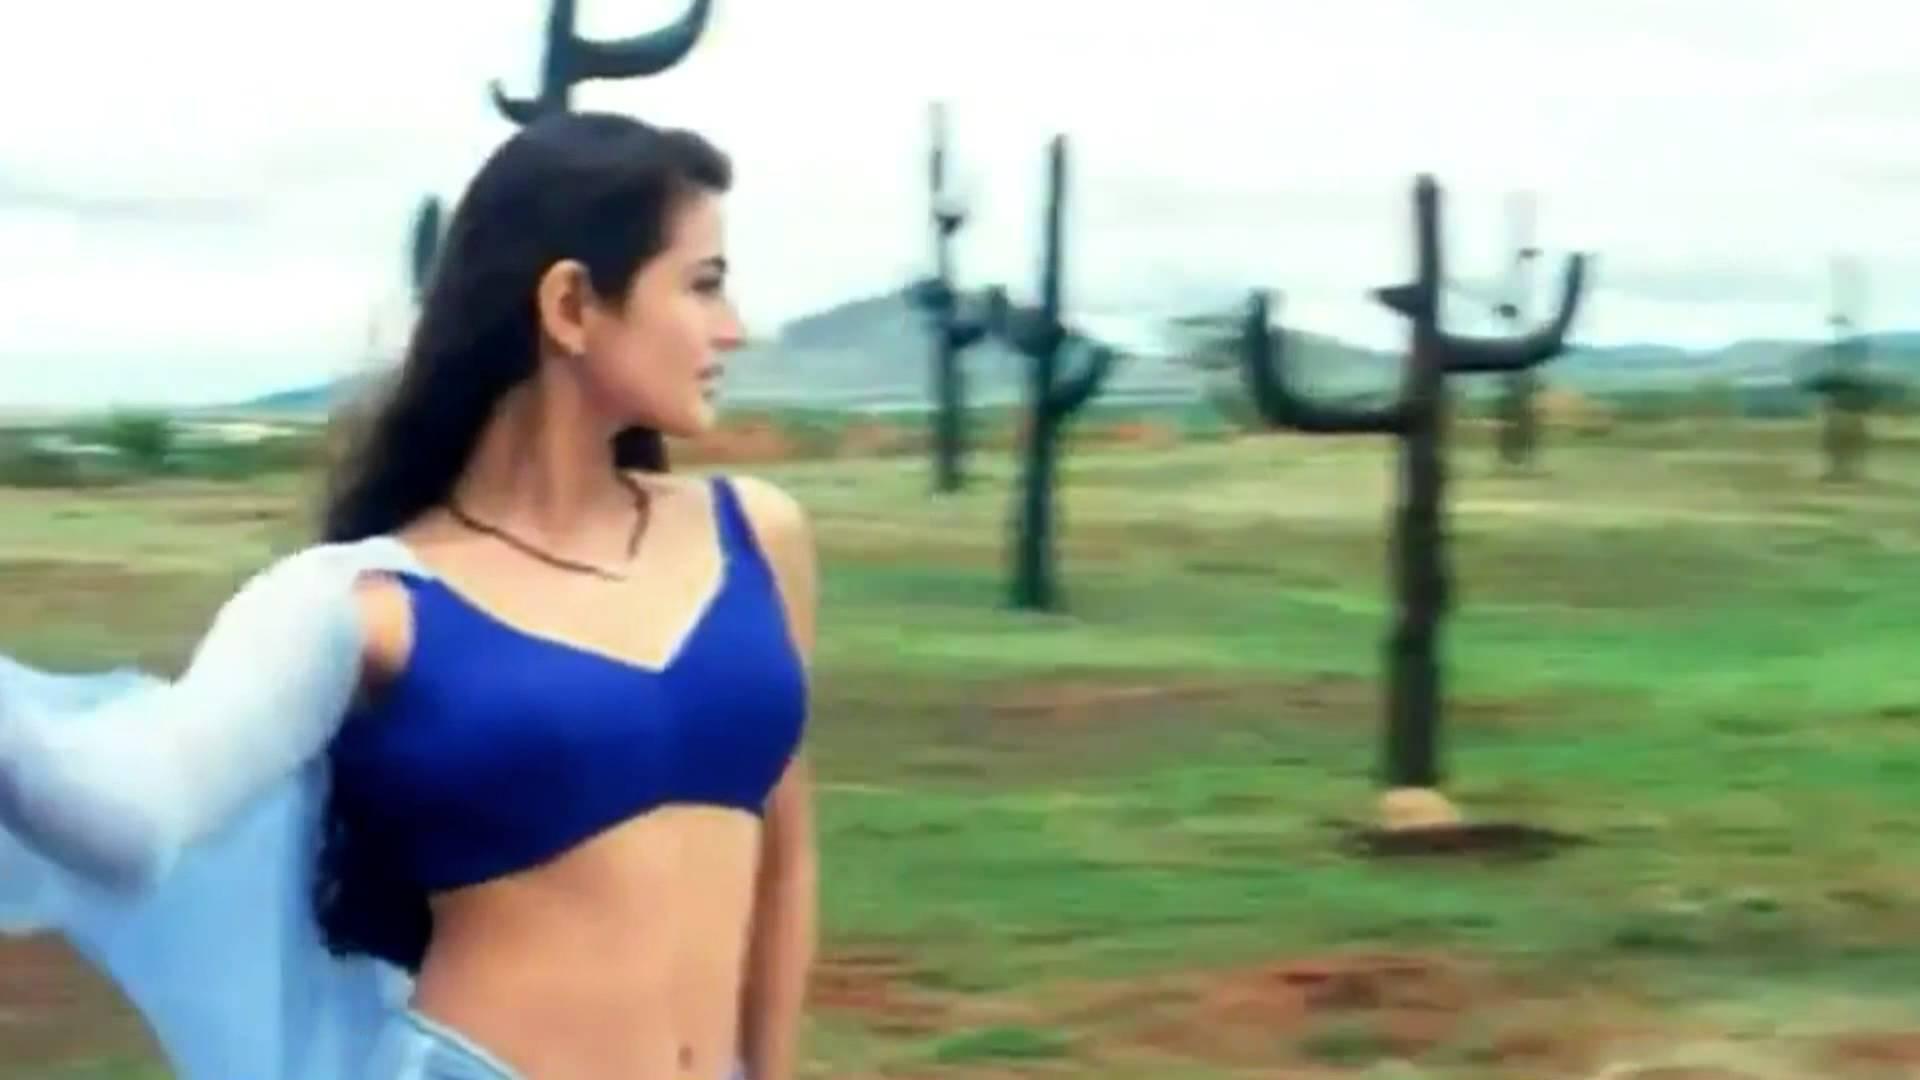 Sanam Mere Humraaz - Humraaz (2002) *HD* 1080p Music Video